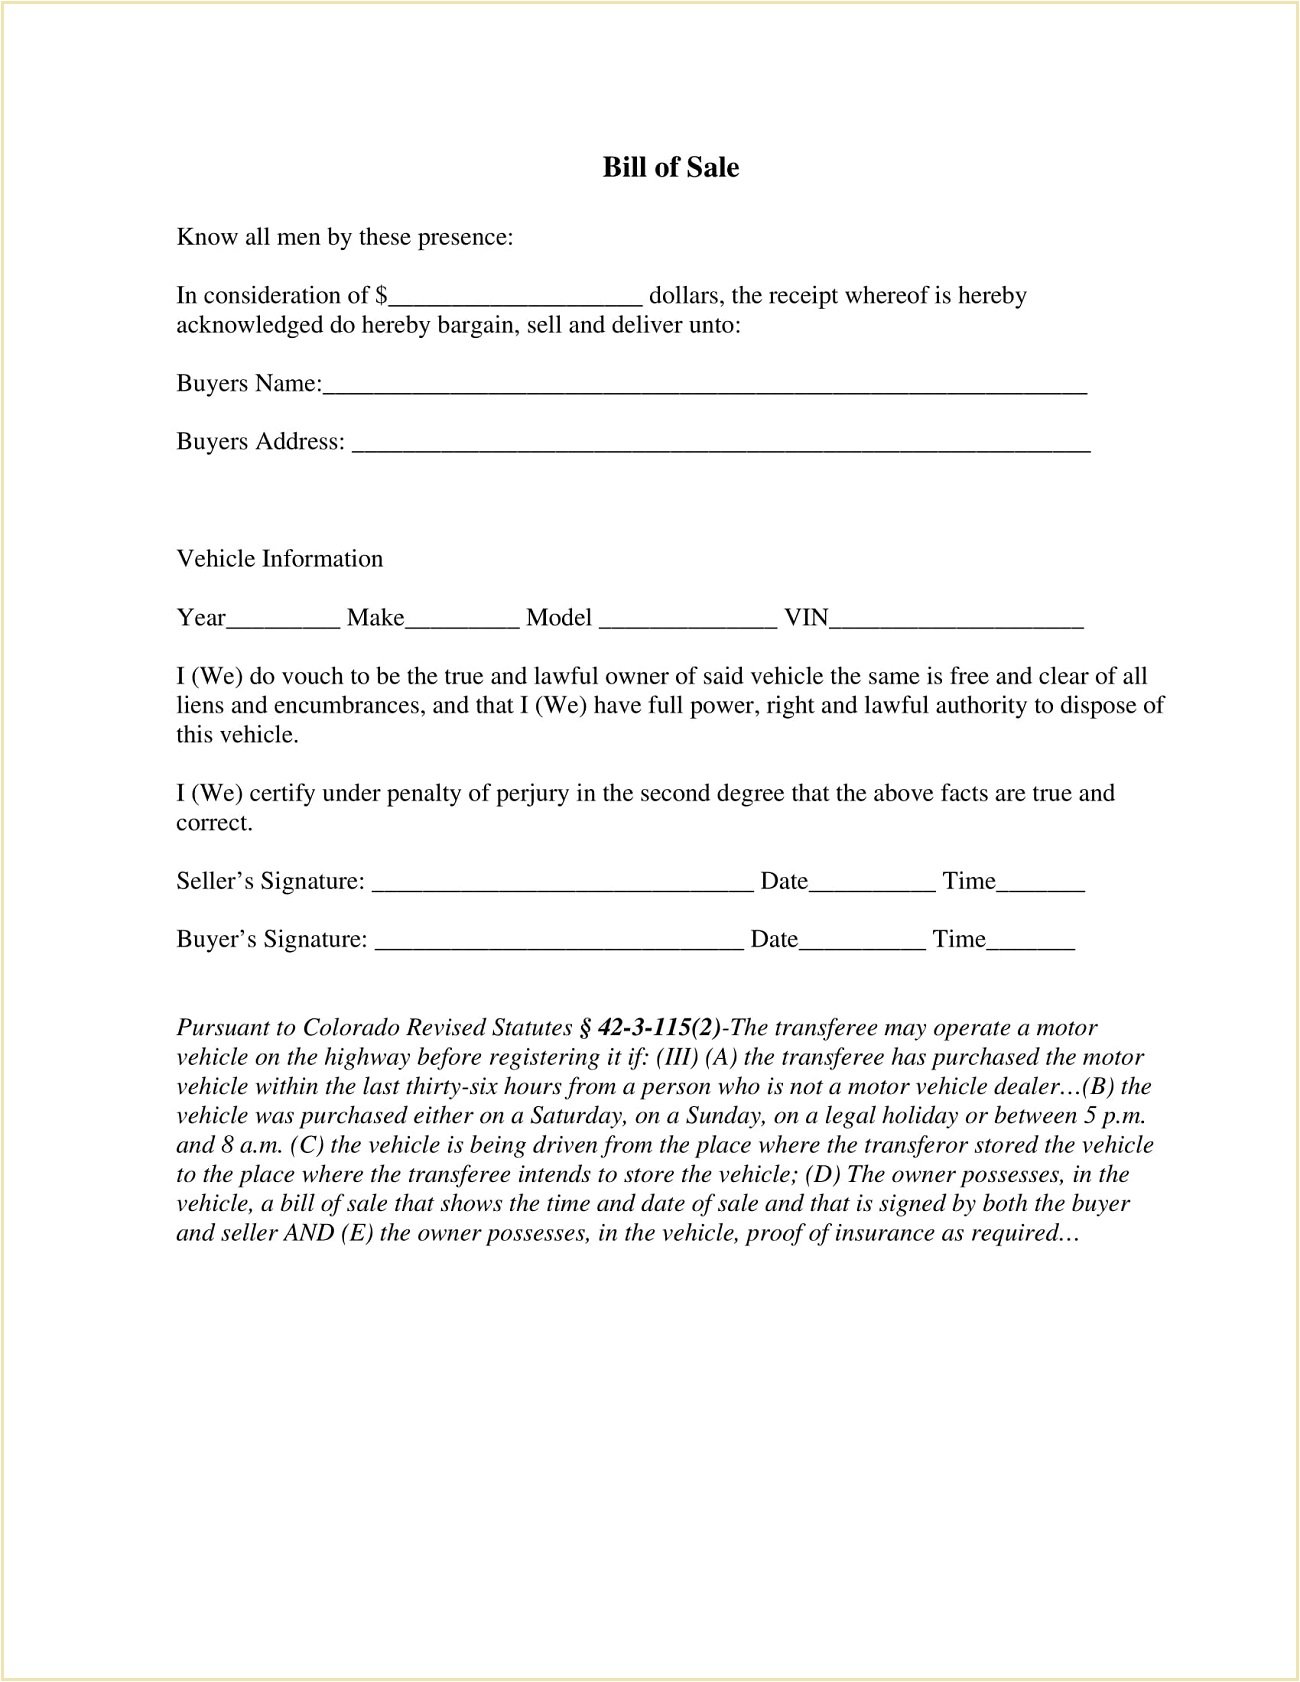 Mesa County Colorado DMV Motor Vehicle Bill of Sale Form PDF